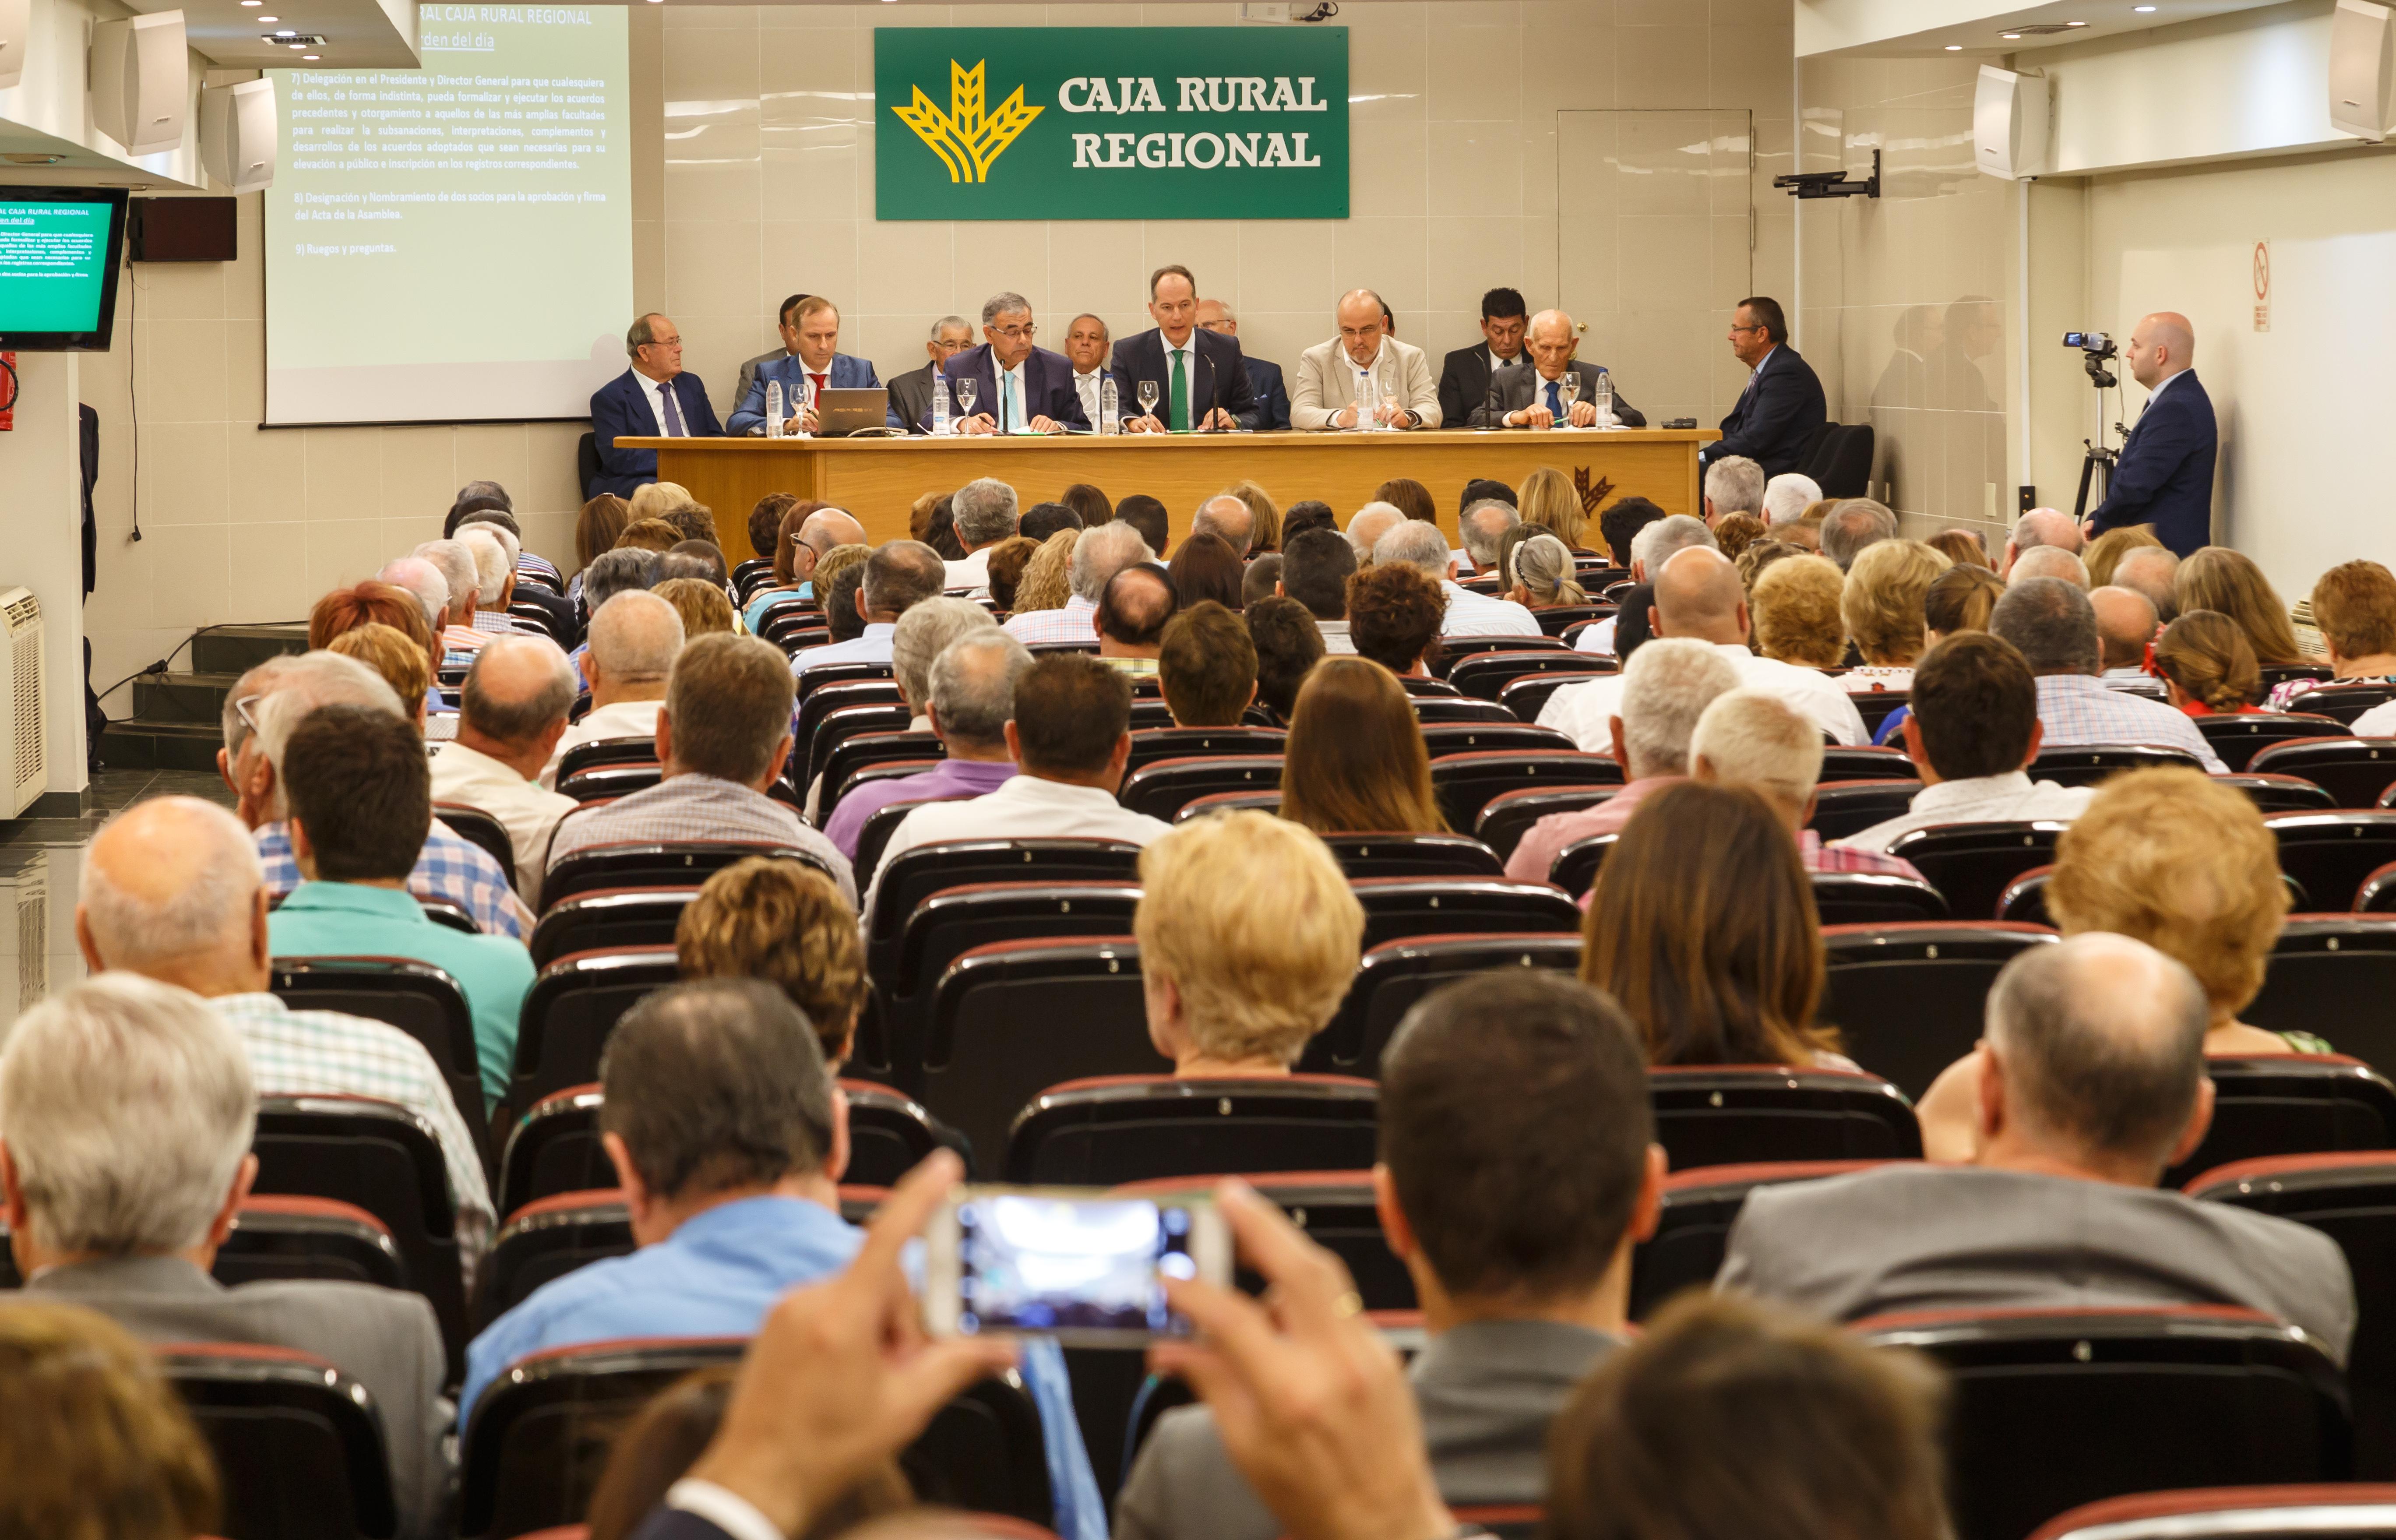 Asamblea General Caja Rural Regional